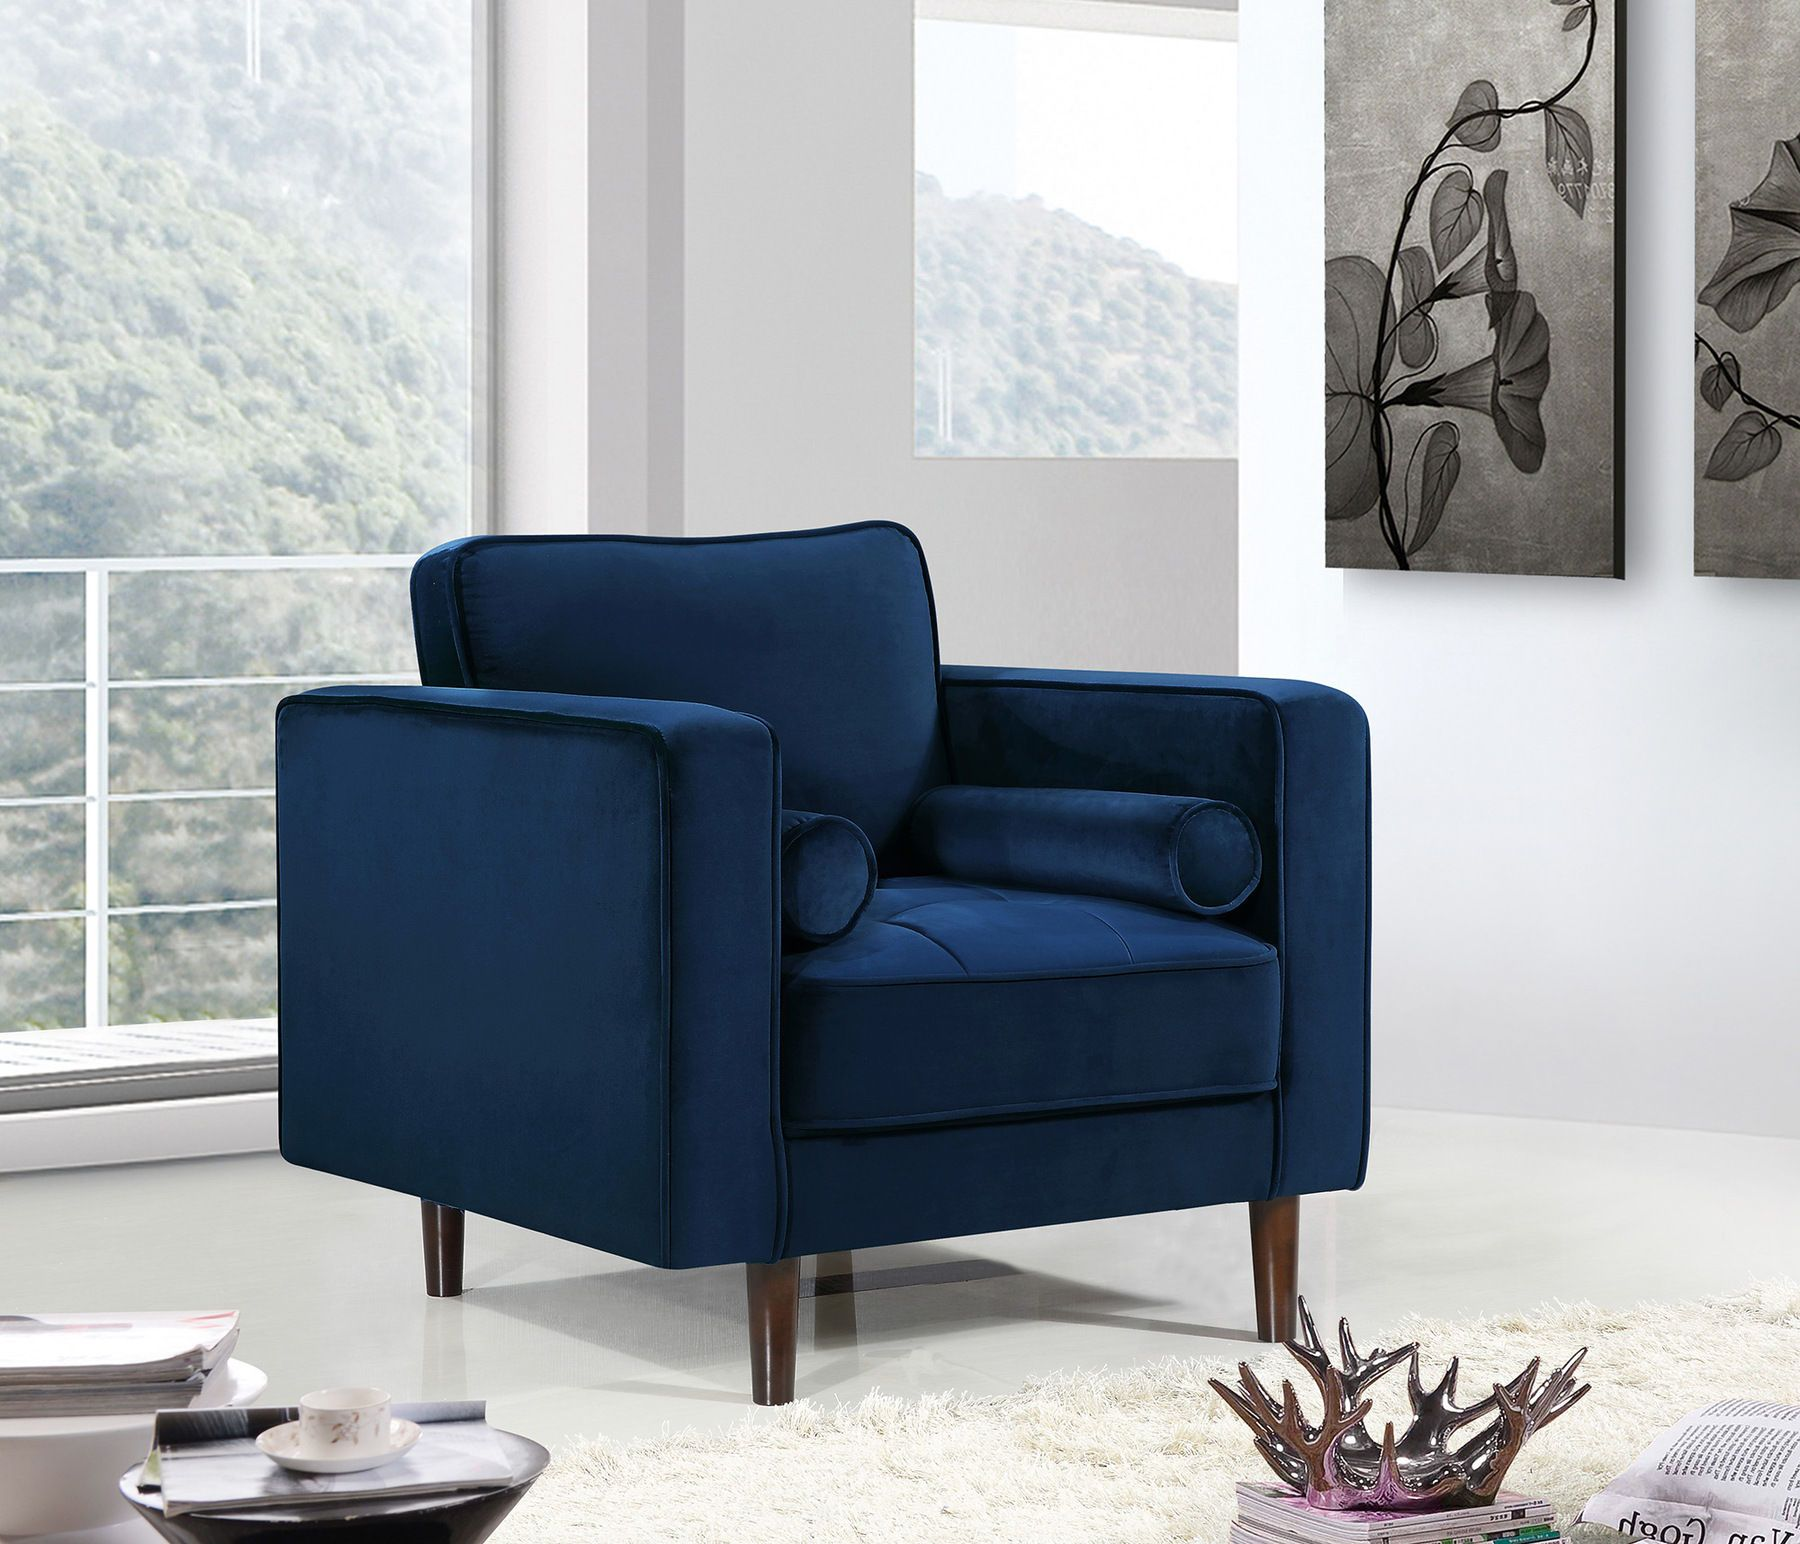 Meridian Emily Navy Velvet Fabric Contemporary Sofa W Tufted Seat In 2019 Meridian Furniture Velvet Sofa Furniture